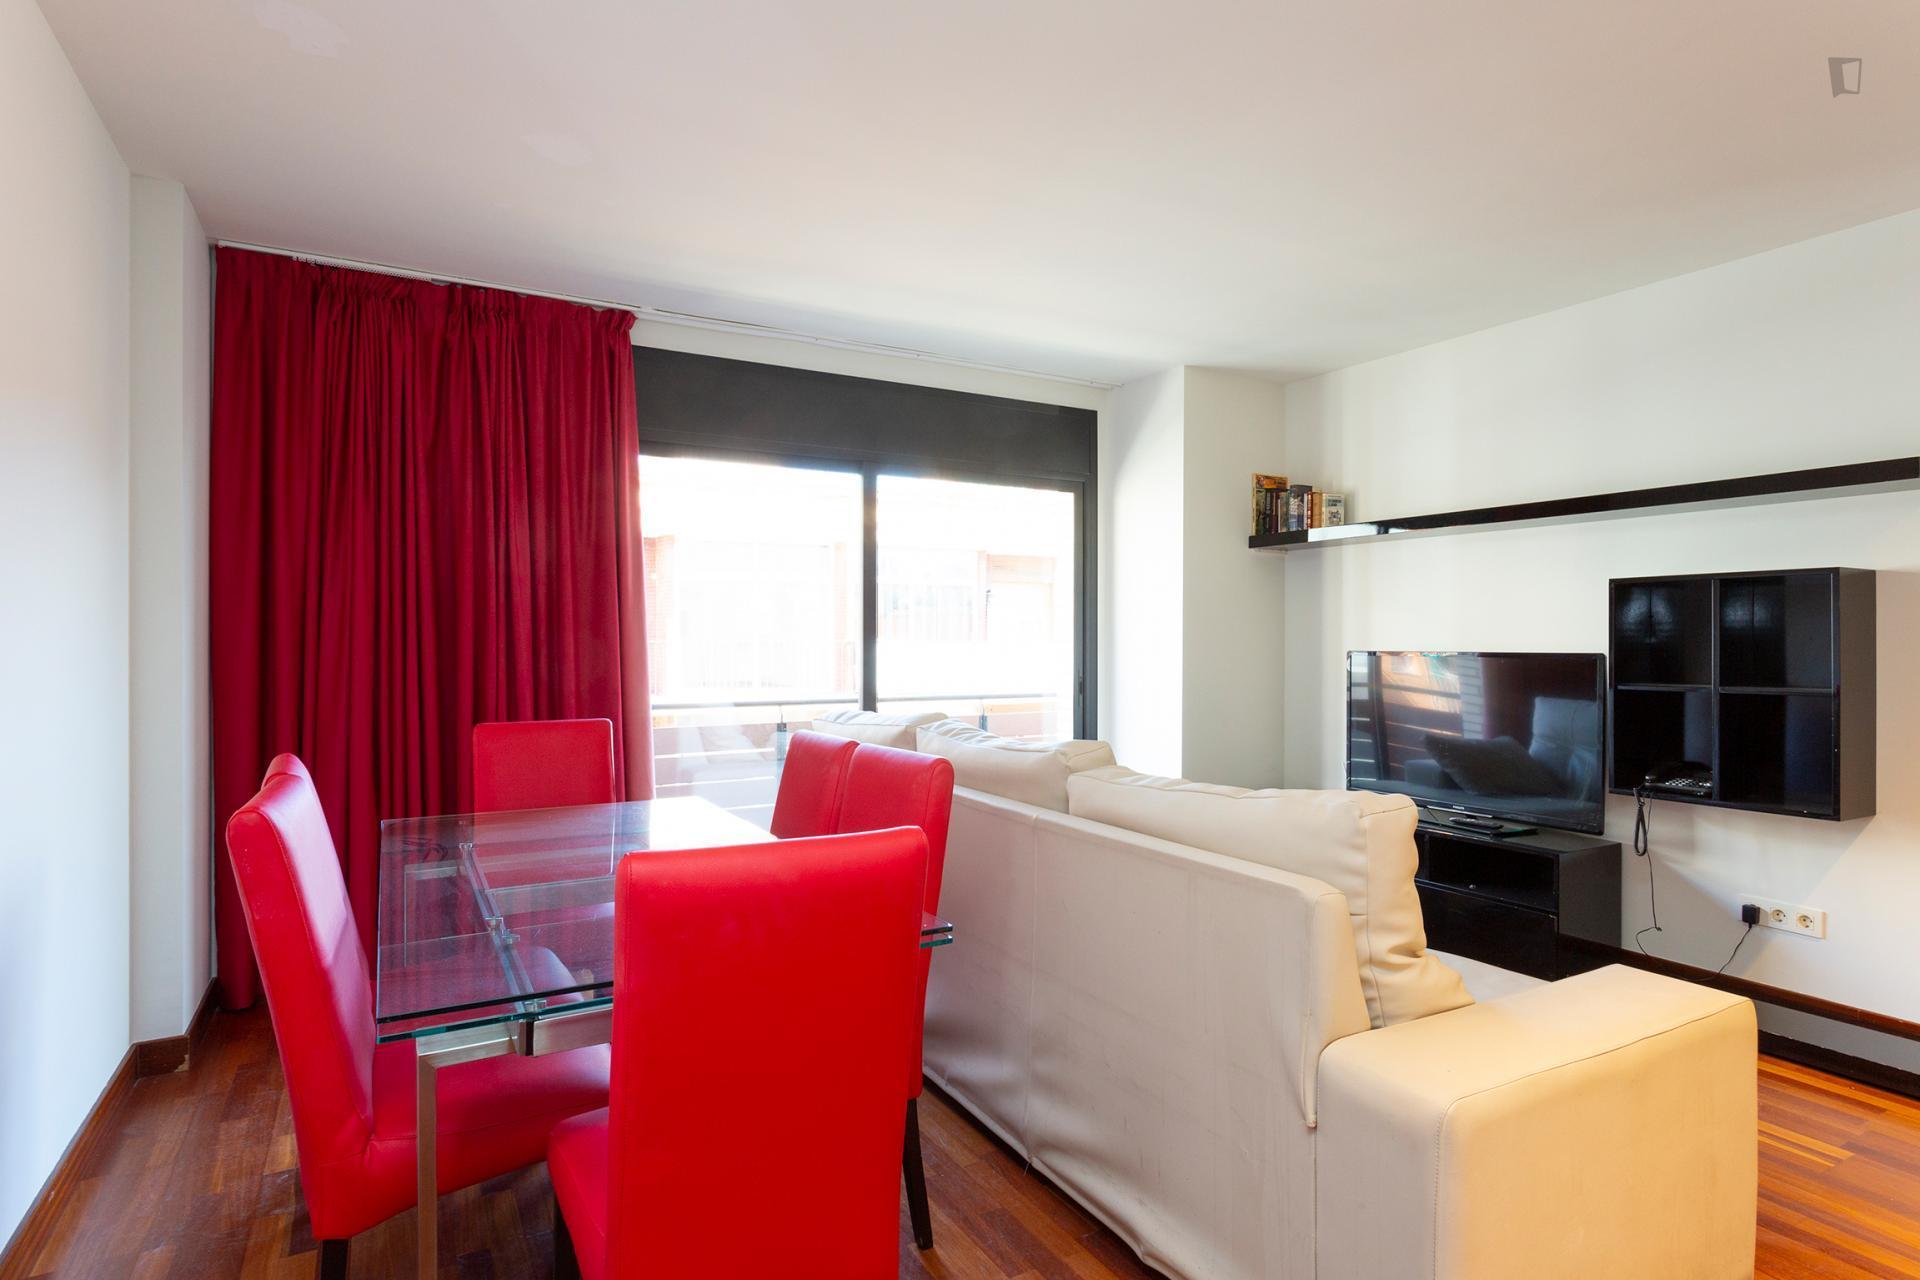 Telegraf - Modern furnished flat in Barcelona